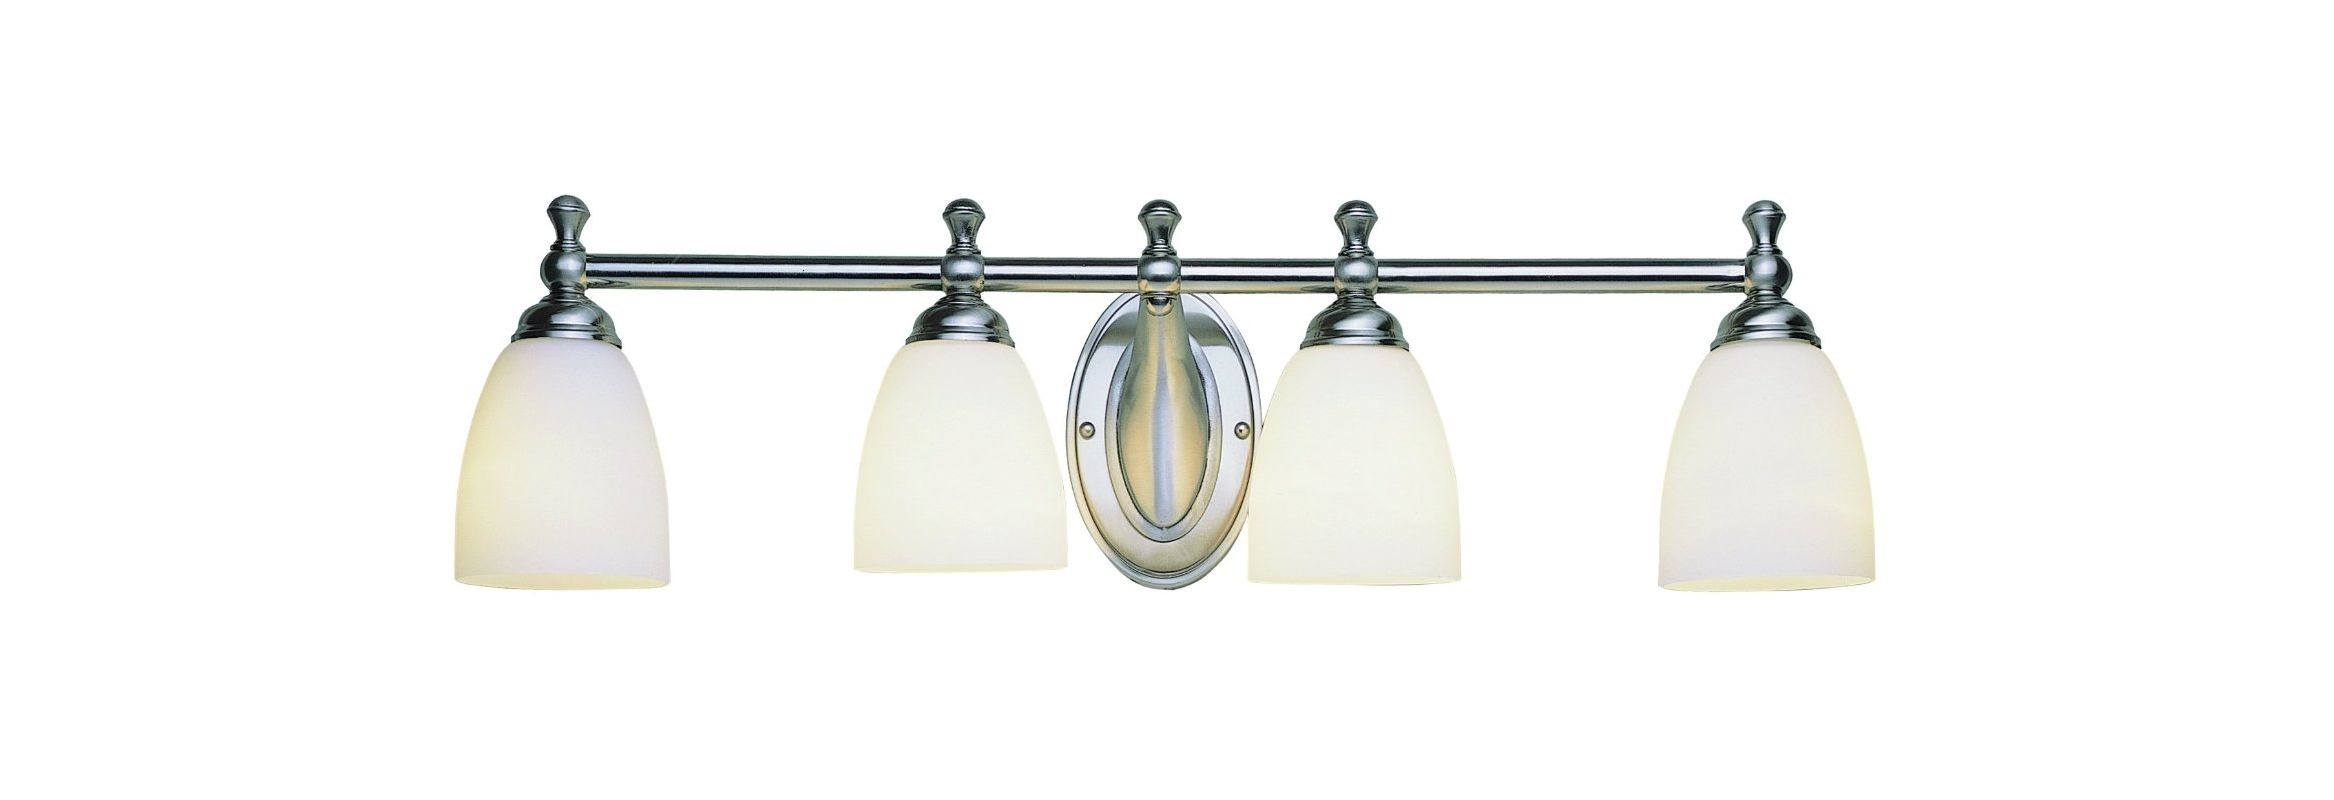 Trans Globe Lighting 3654 Four Light Up Lighting Wall Sconce Brushed Sale $188.10 ITEM: bci723065 ID#:3654 BN UPC: 736916246620 :